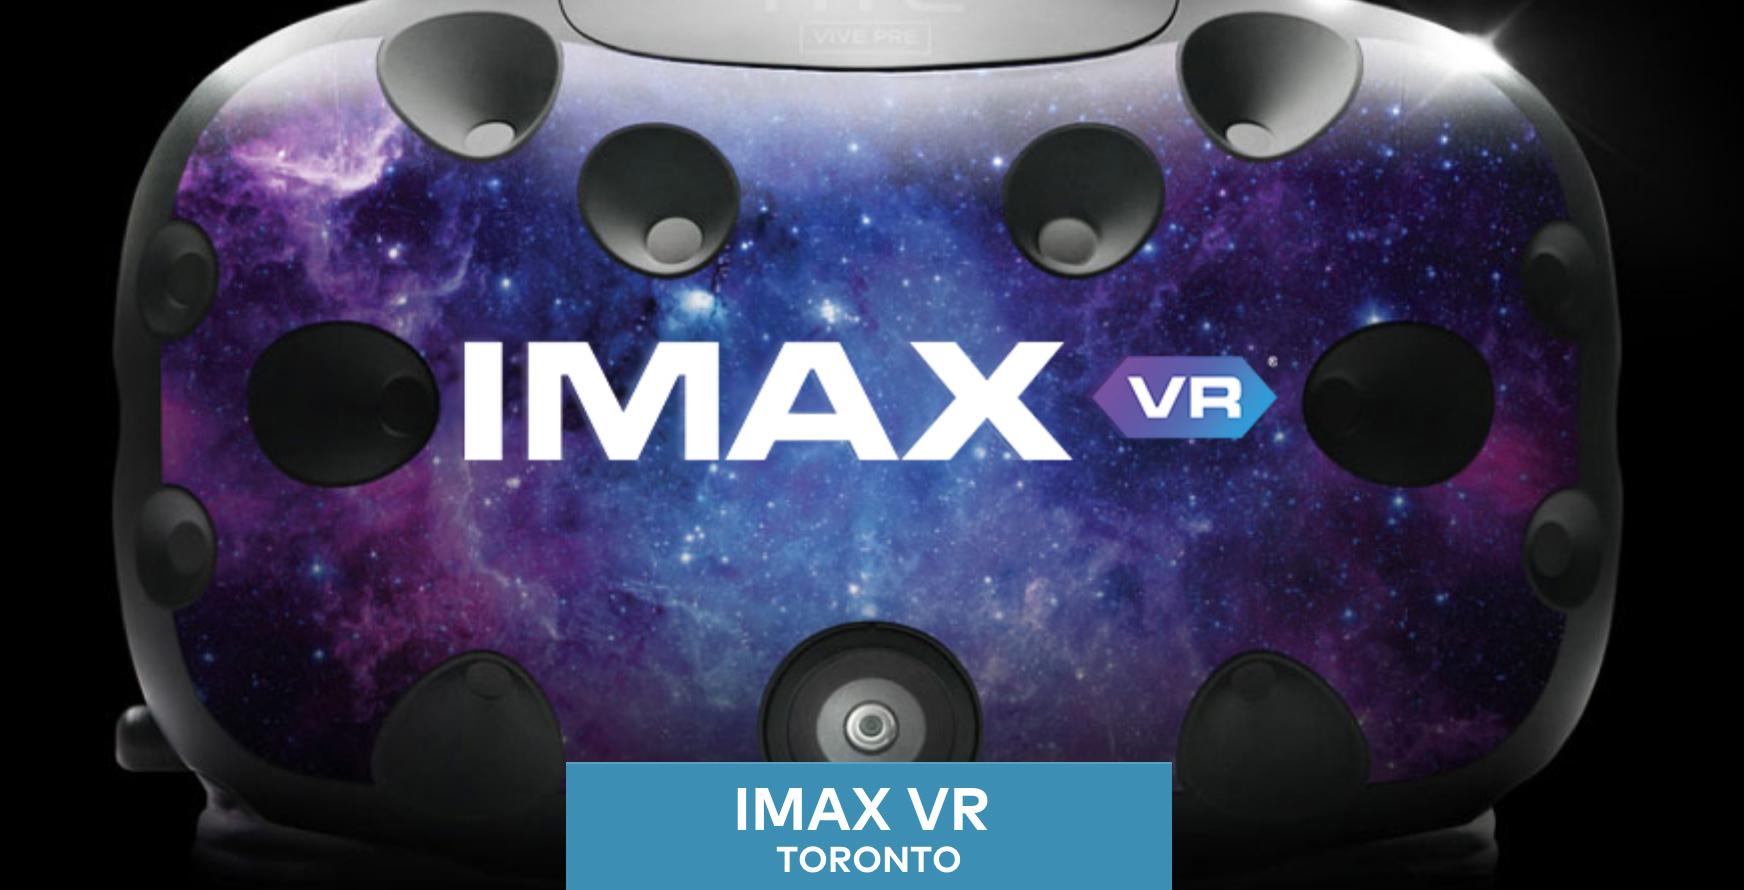 IMAX VR experience Toronto